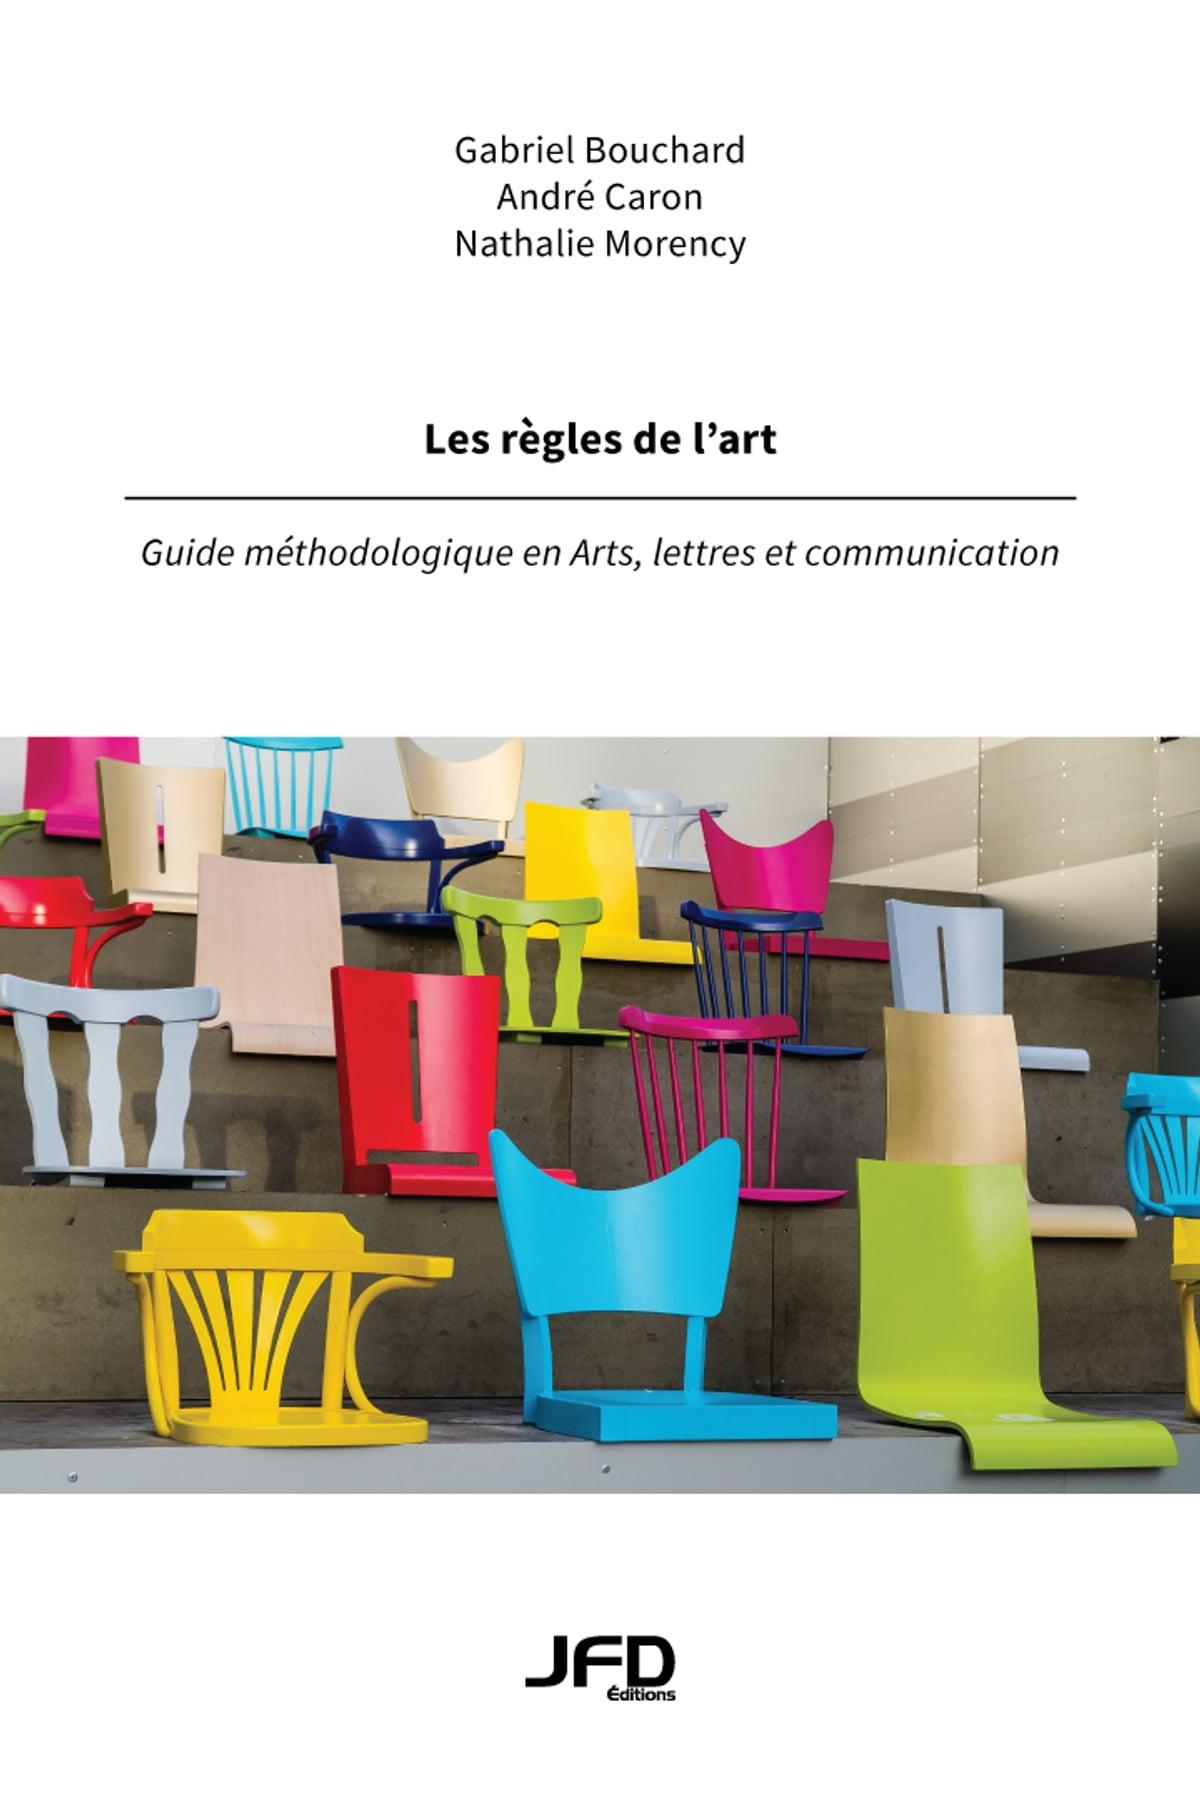 Dans Les Règles De L'art : règles, l'art, Règles, L'art, EBook, Gabriel, Bouchard, 1230002392004, Rakuten, Canada